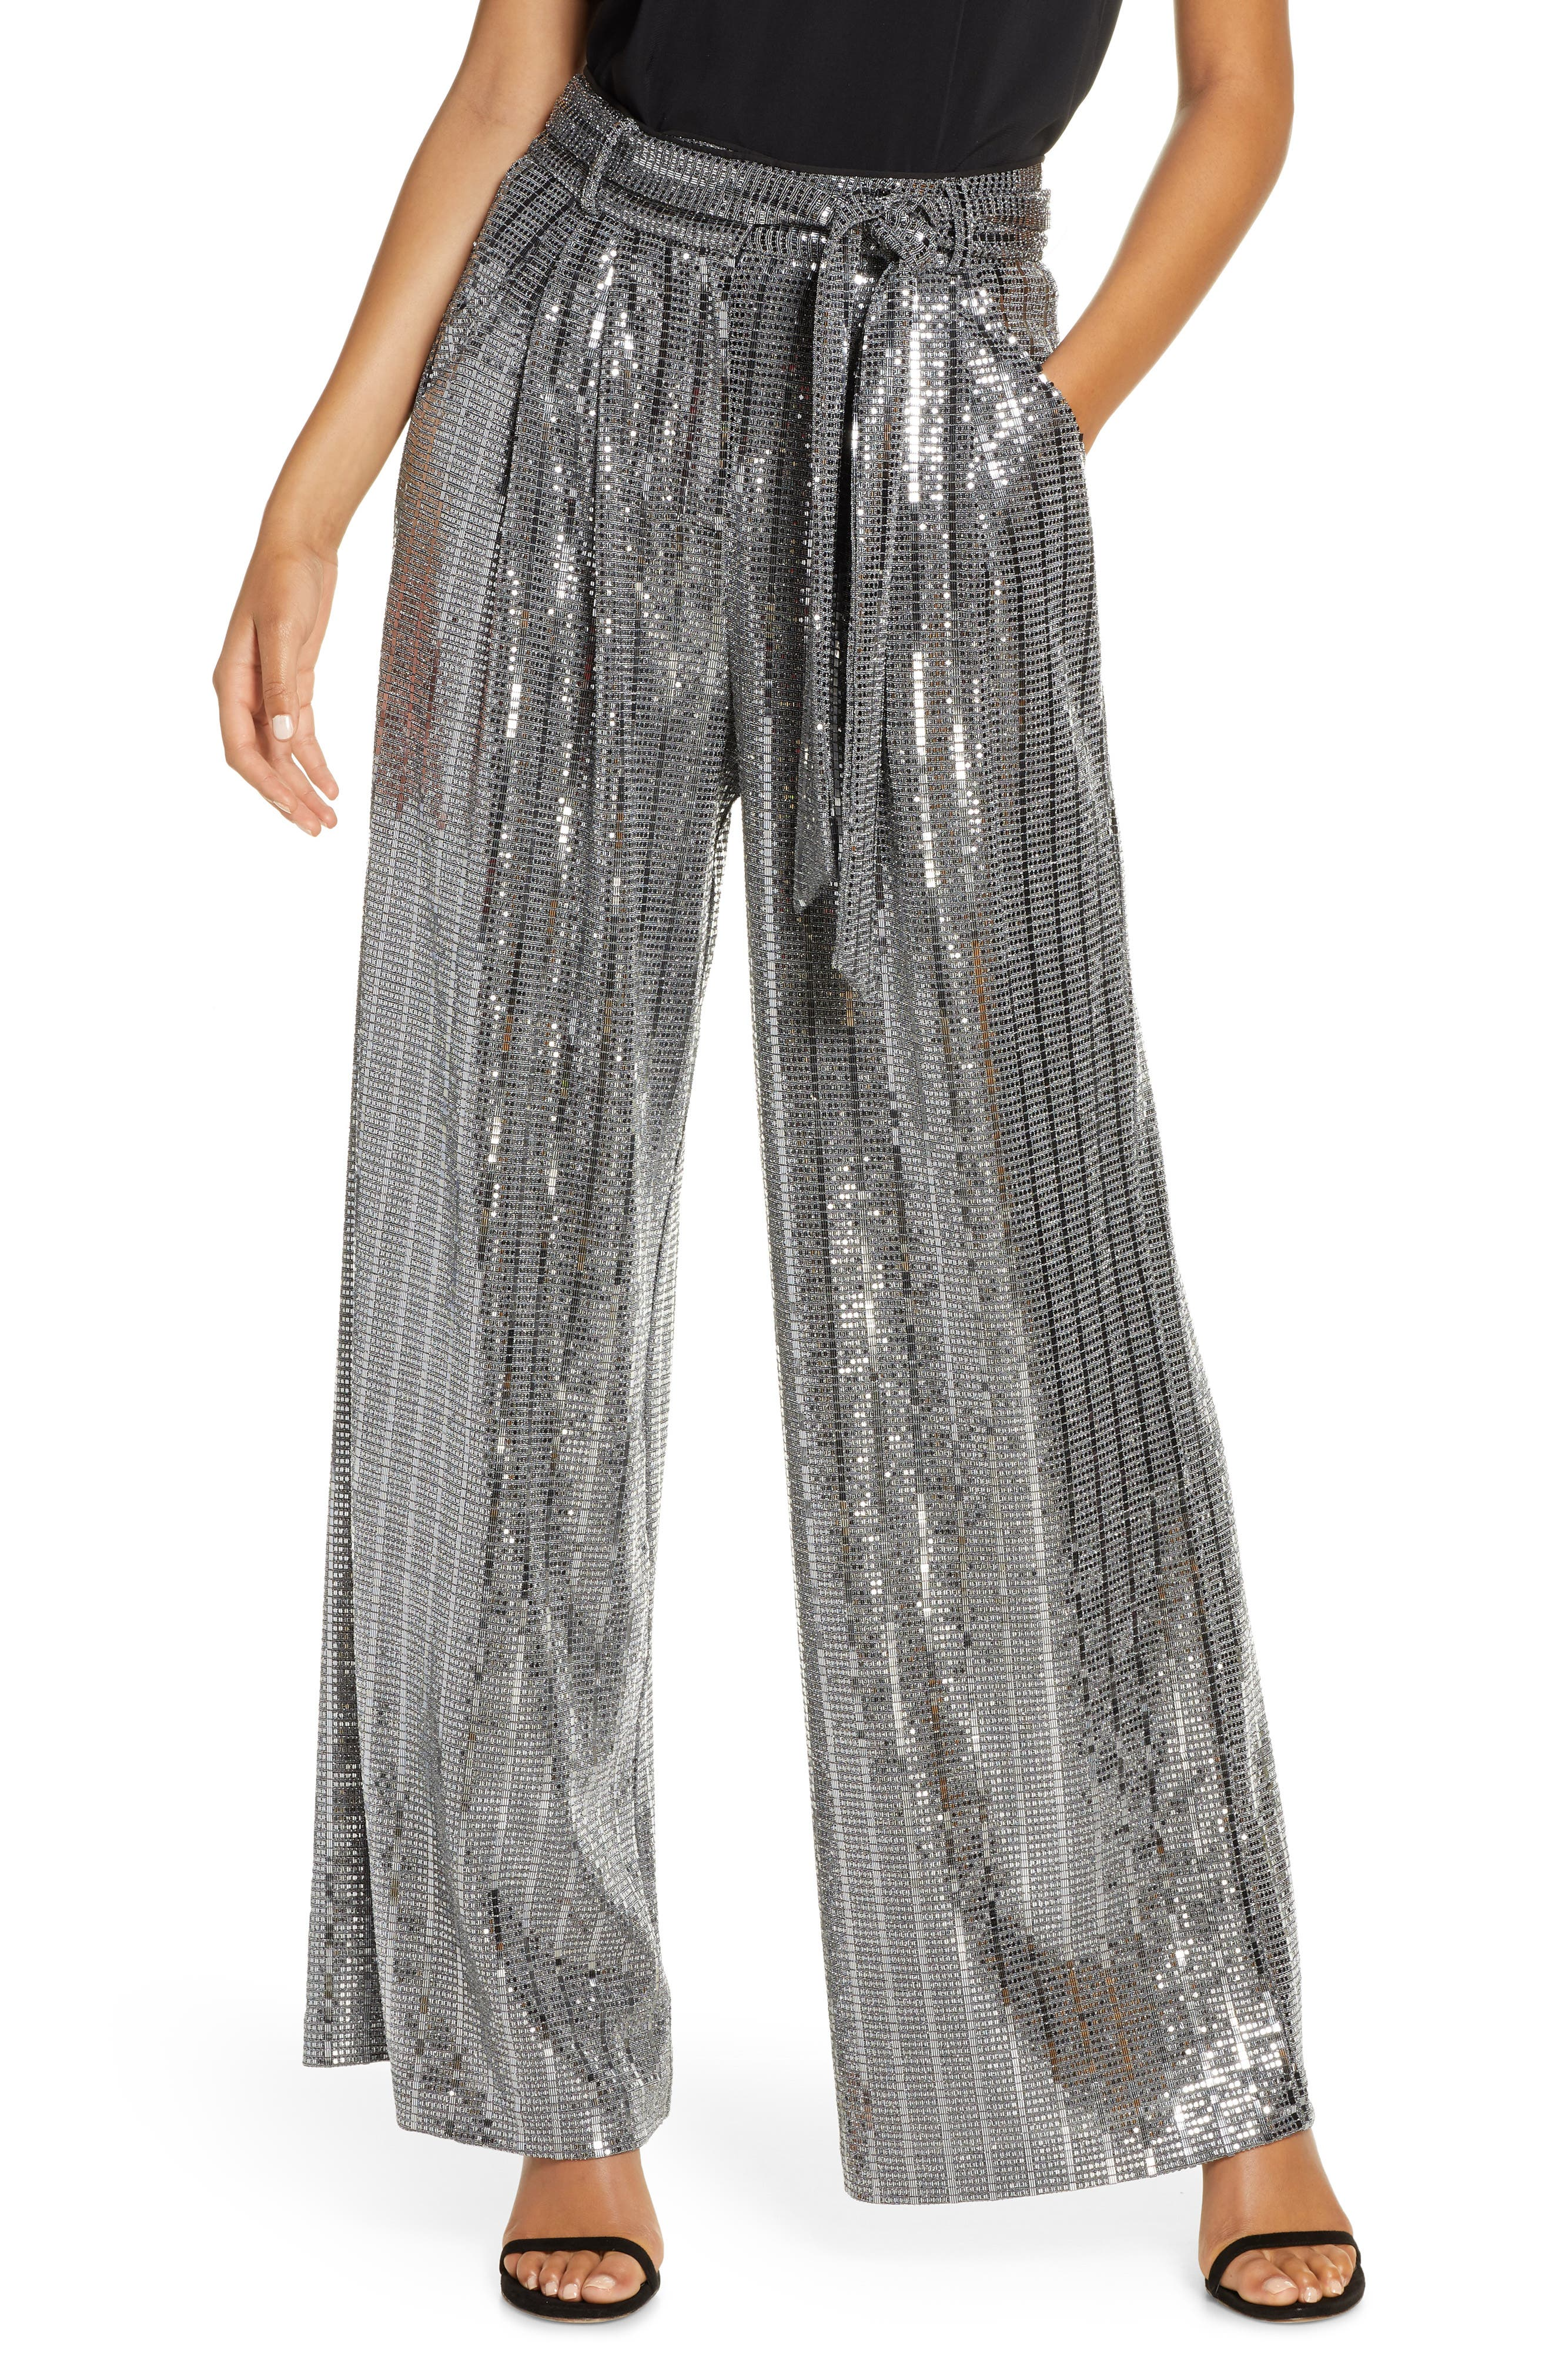 Vintage High Waisted Trousers, Sailor Pants, Jeans Womens Eliza J Wide Leg Sequin Pants $188.00 AT vintagedancer.com